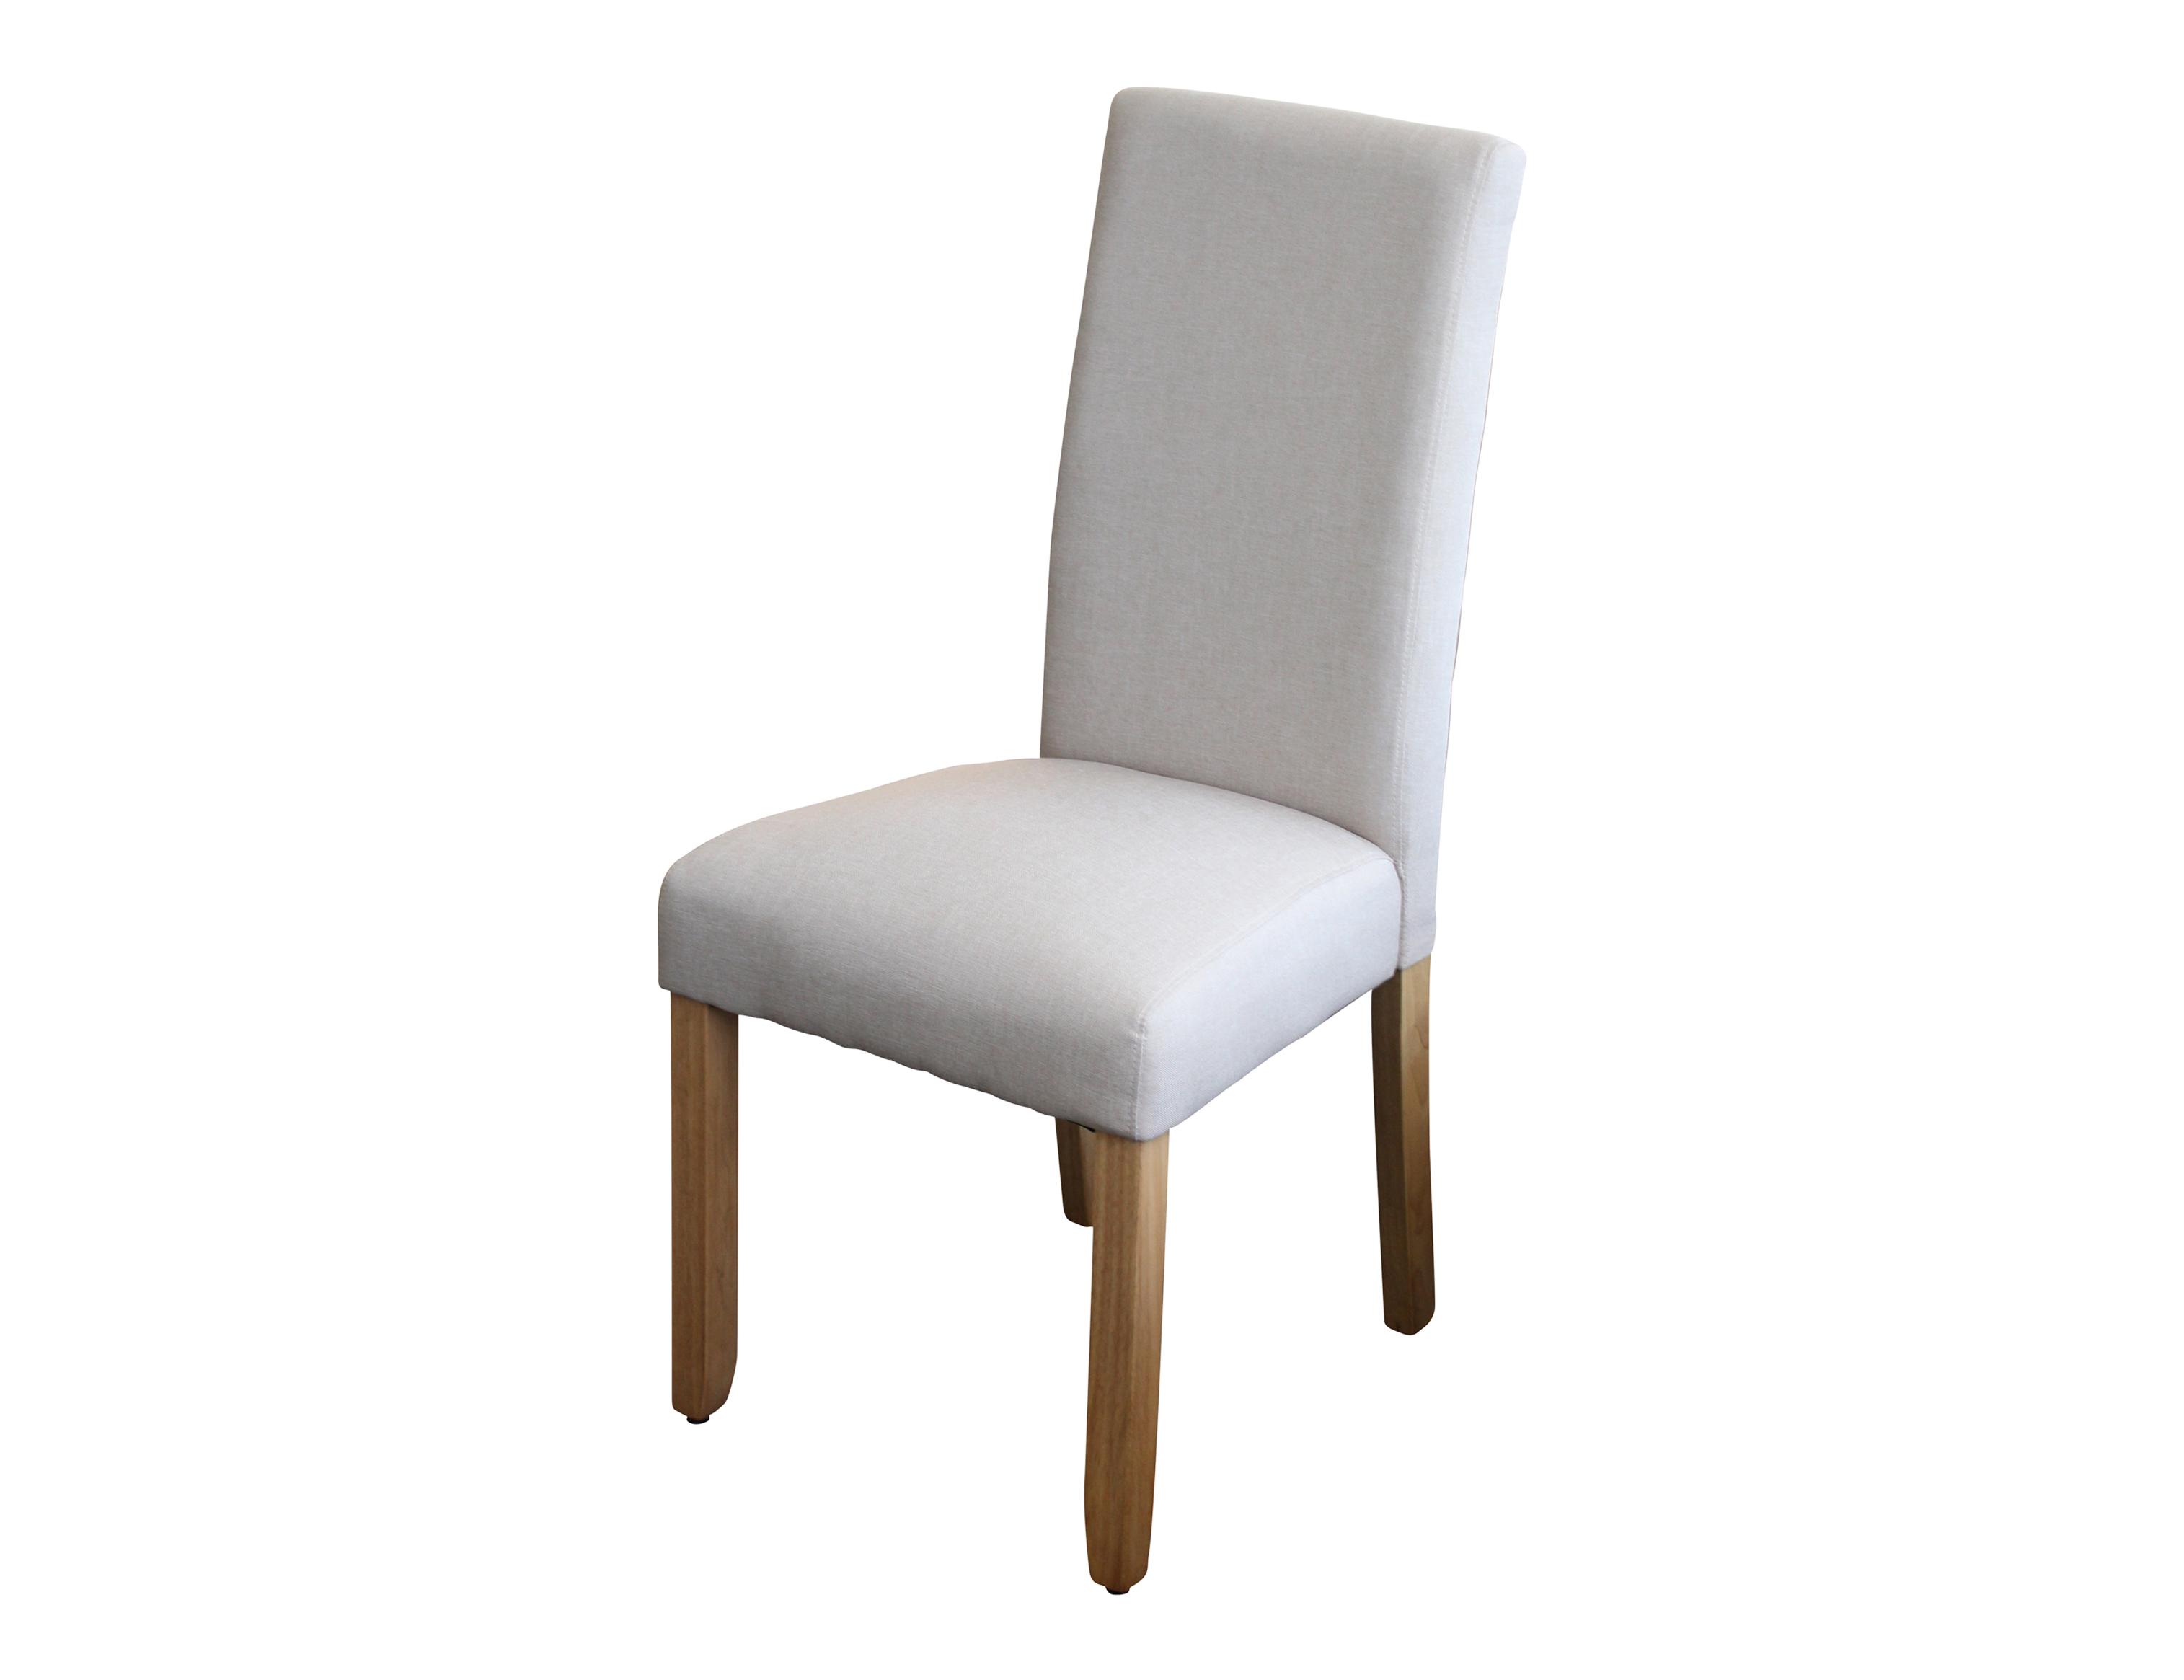 Ashton Dining Chair Upholstered In Beige Fabric Berton